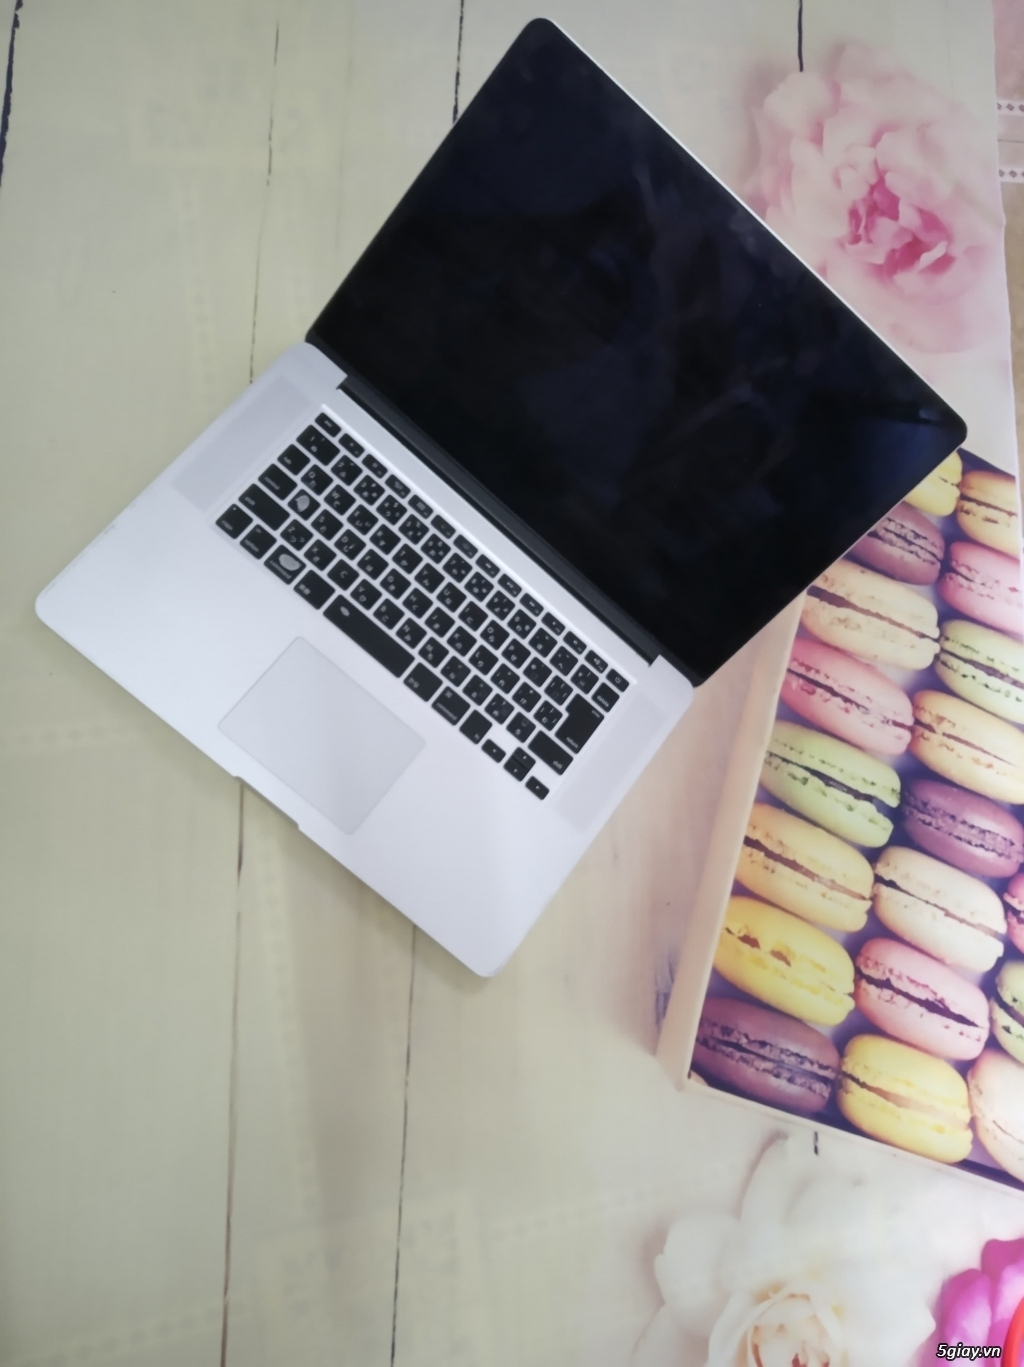 Macbook Pro Retina 15inch Core i7, Ram 8GB, 256GB SSD